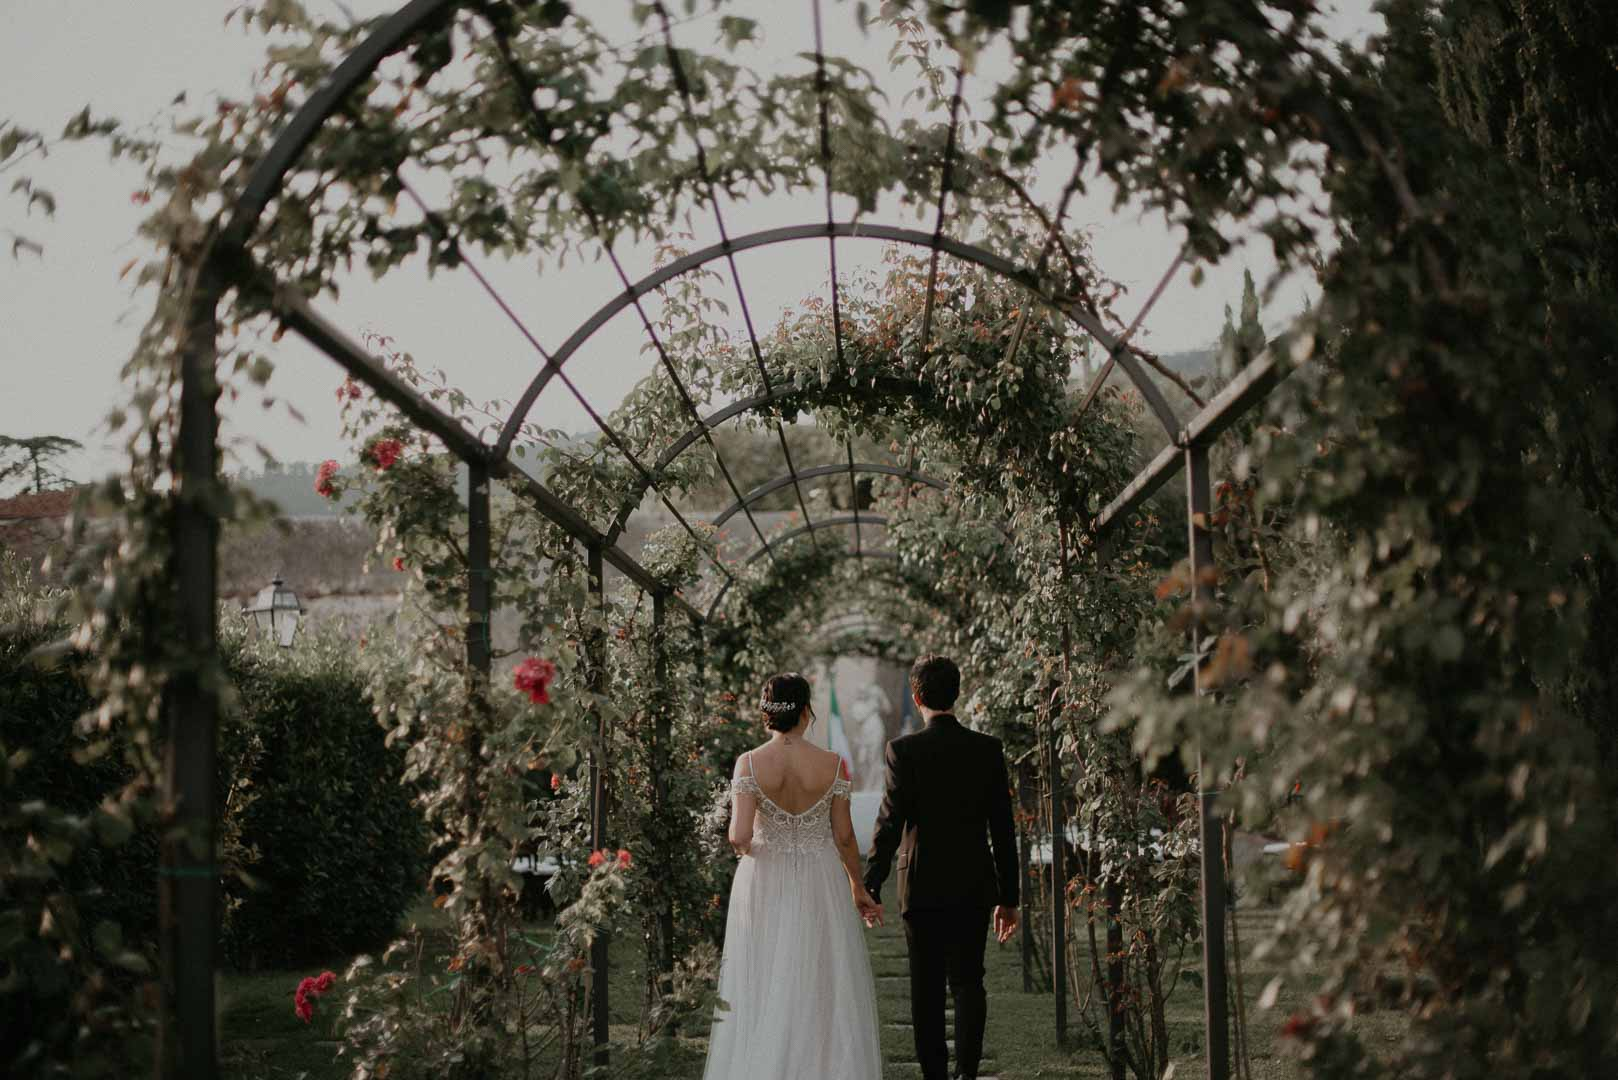 wedding-photographer-destination-fineart-bespoke-reportage-tuscany-villascorzi-vivianeizzo-spazio46-90